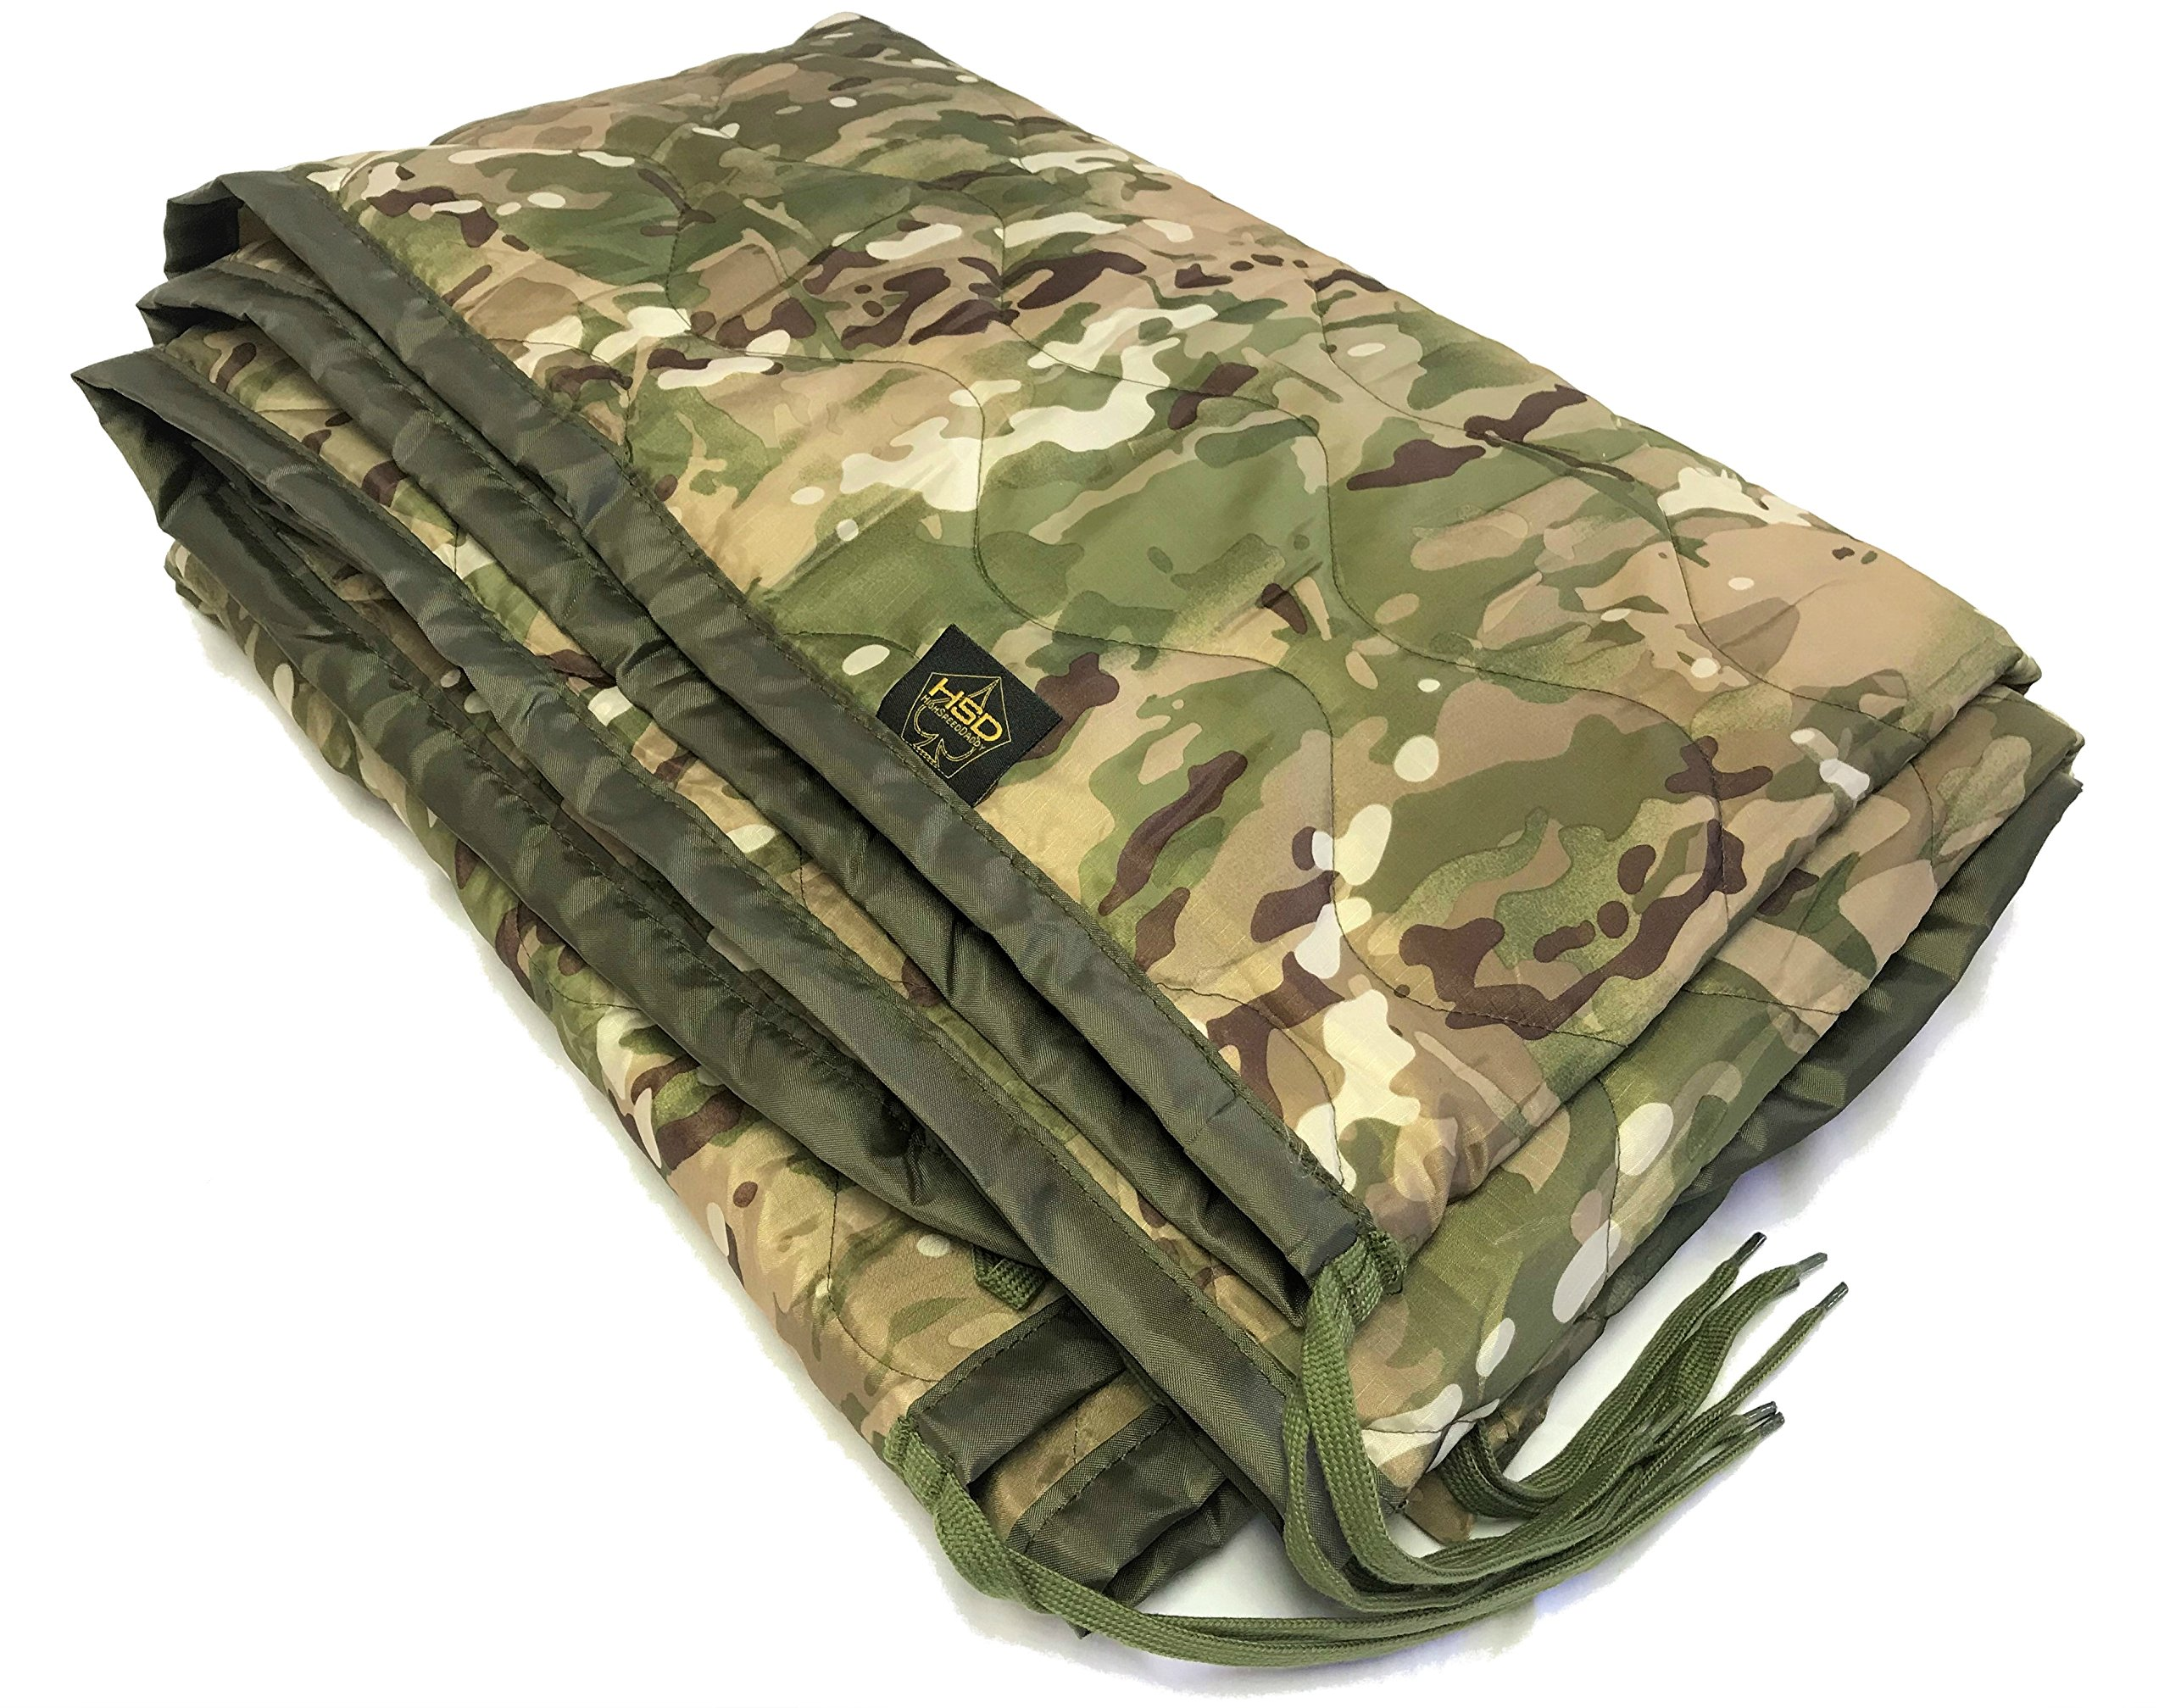 HighSpeedDaddy HSD Mini Woobie Military Style Poncho Liner Kids Baby Blanket (Multicam, Adult) by HighSpeedDaddy